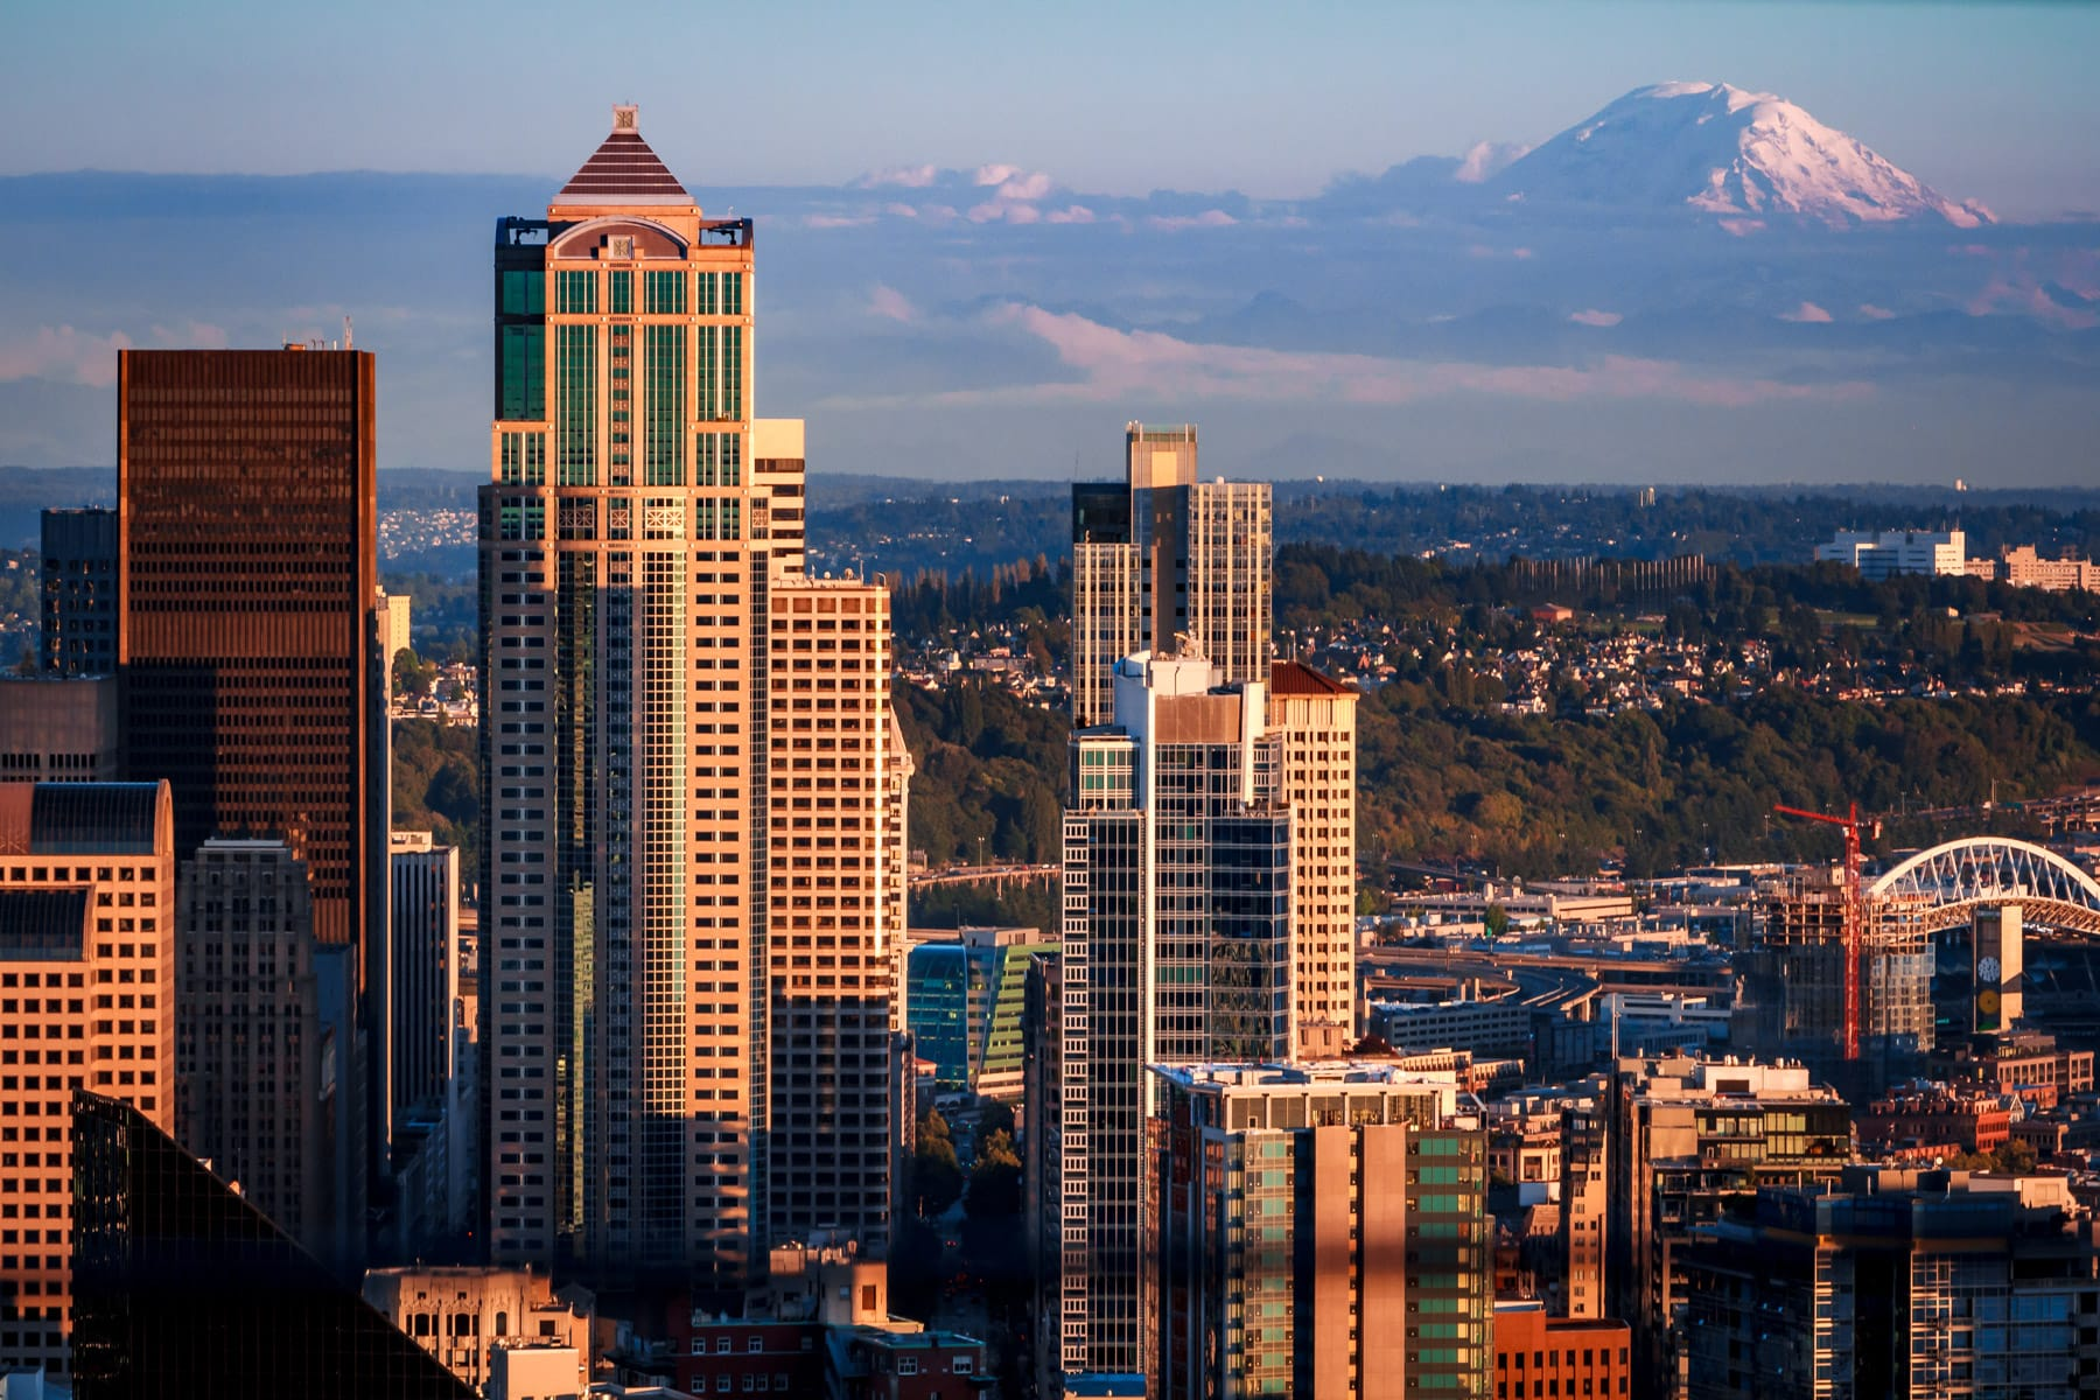 Mount Rainier looms over the Seattle cityscape.